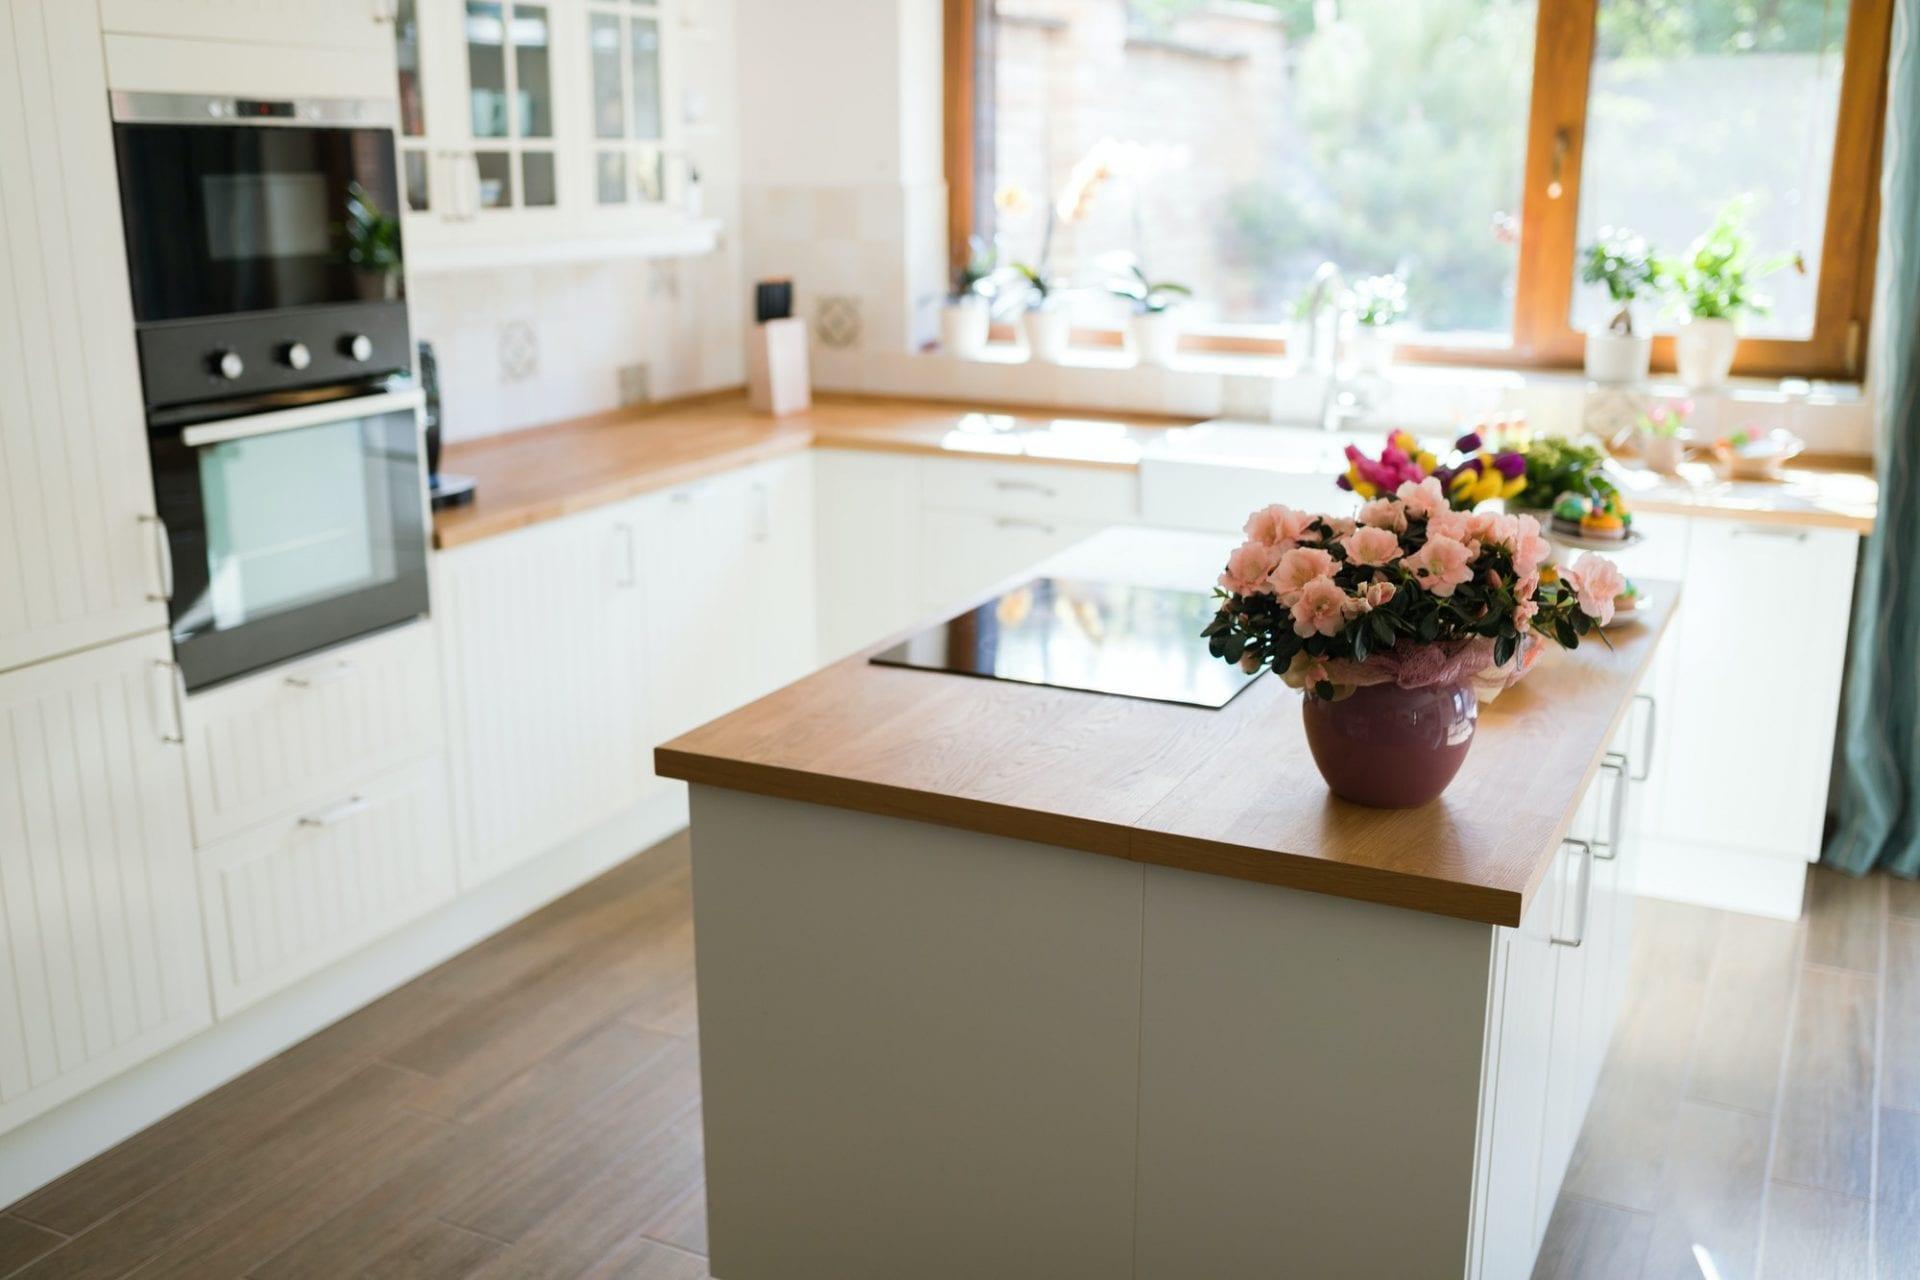 Modern kitchen with TopWood laminate worktop